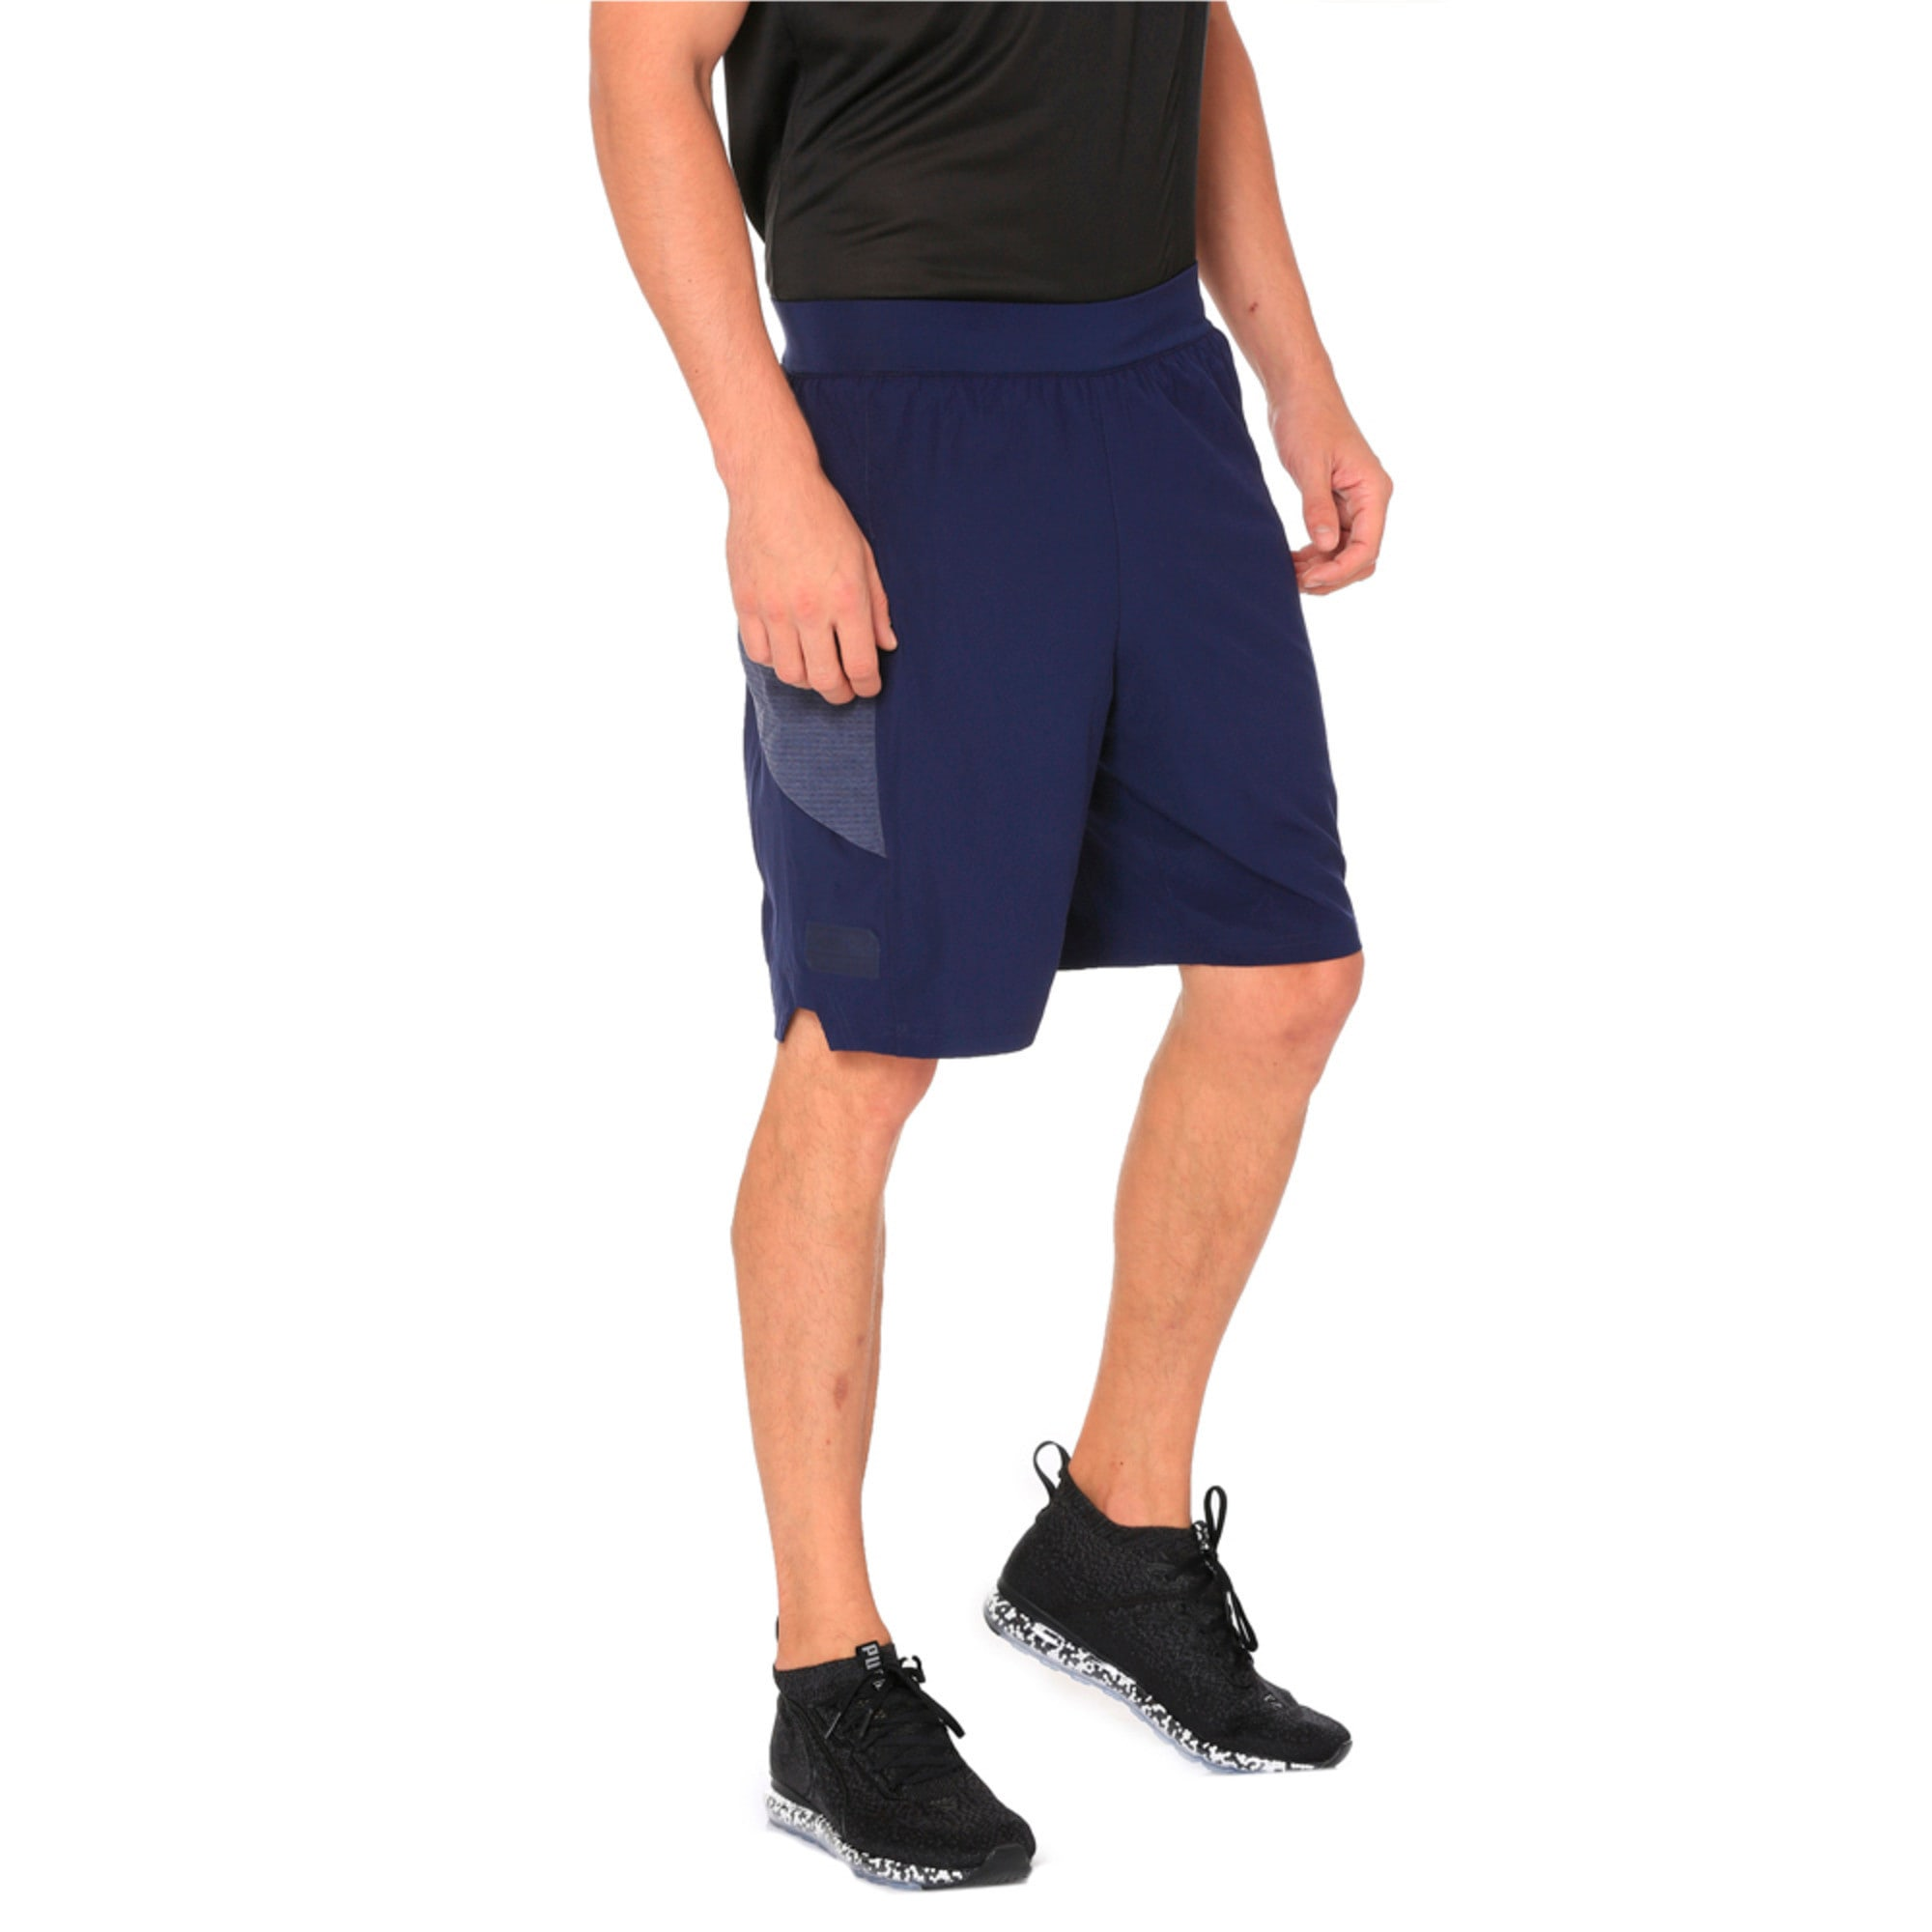 Thumbnail 3 of NeverRunBack 9'' Men's Training Shorts, Peacoat, medium-IND